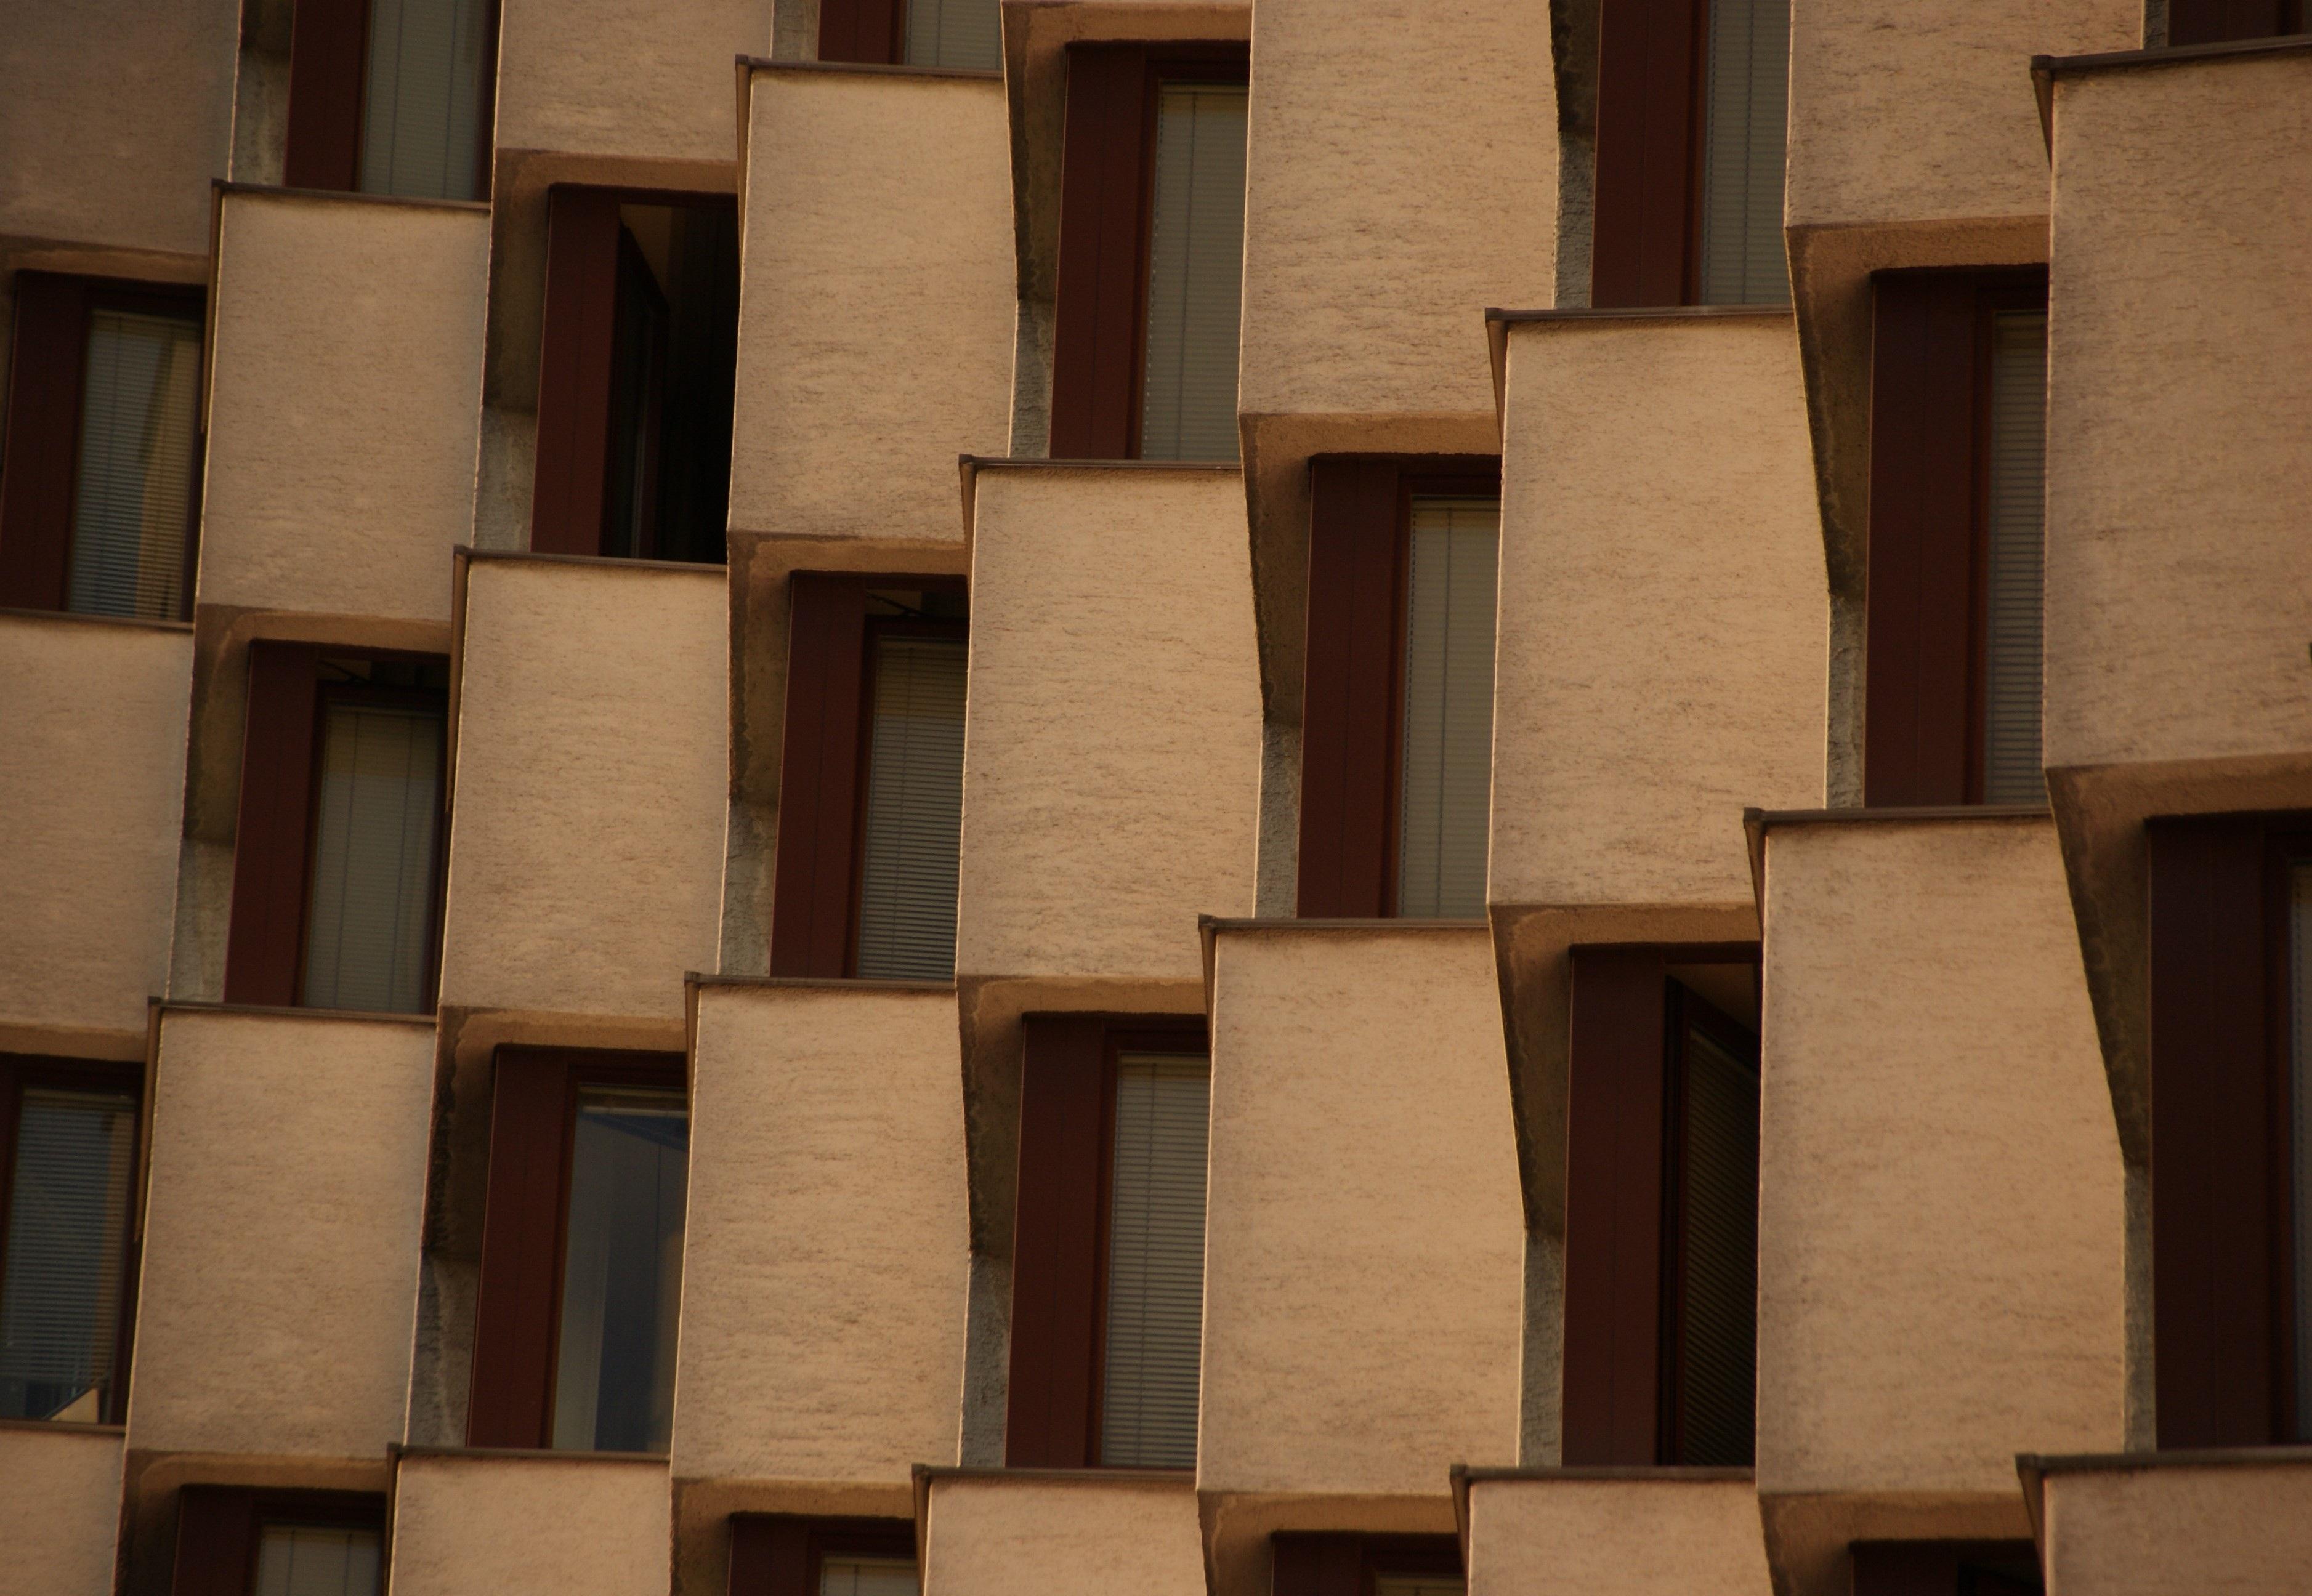 Architecture Wood Floor City Wall Facade Tile Furniture Brick Lumber  Apartment Interior Design Art Design Hardwood